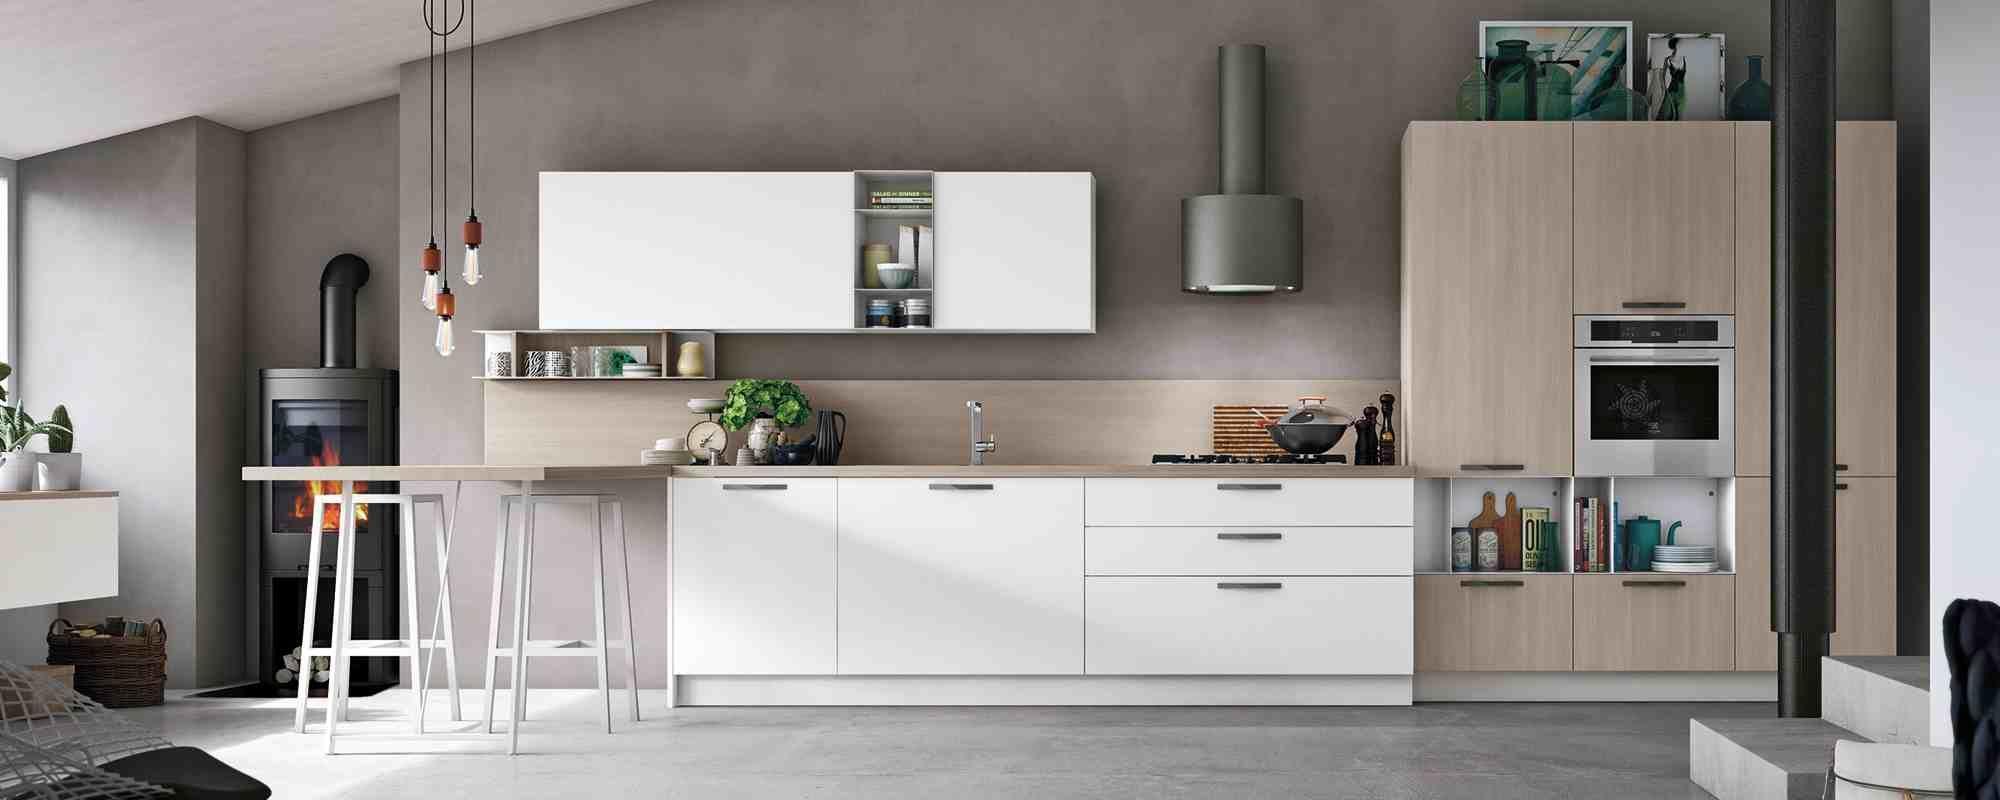 Cucine Moderne Stosa   Modello Cucina Infinity 18